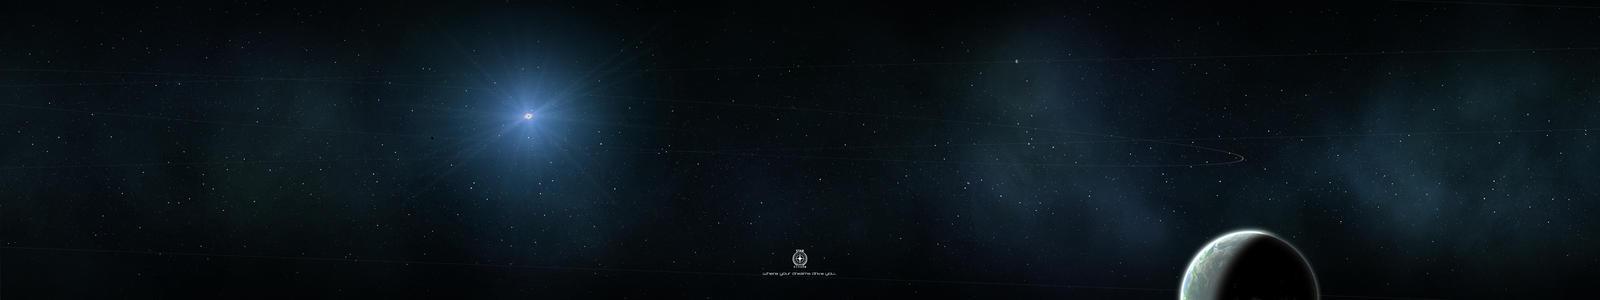 Triple Screen Star Citizen Wallpaper By Logan0015 On Deviantart